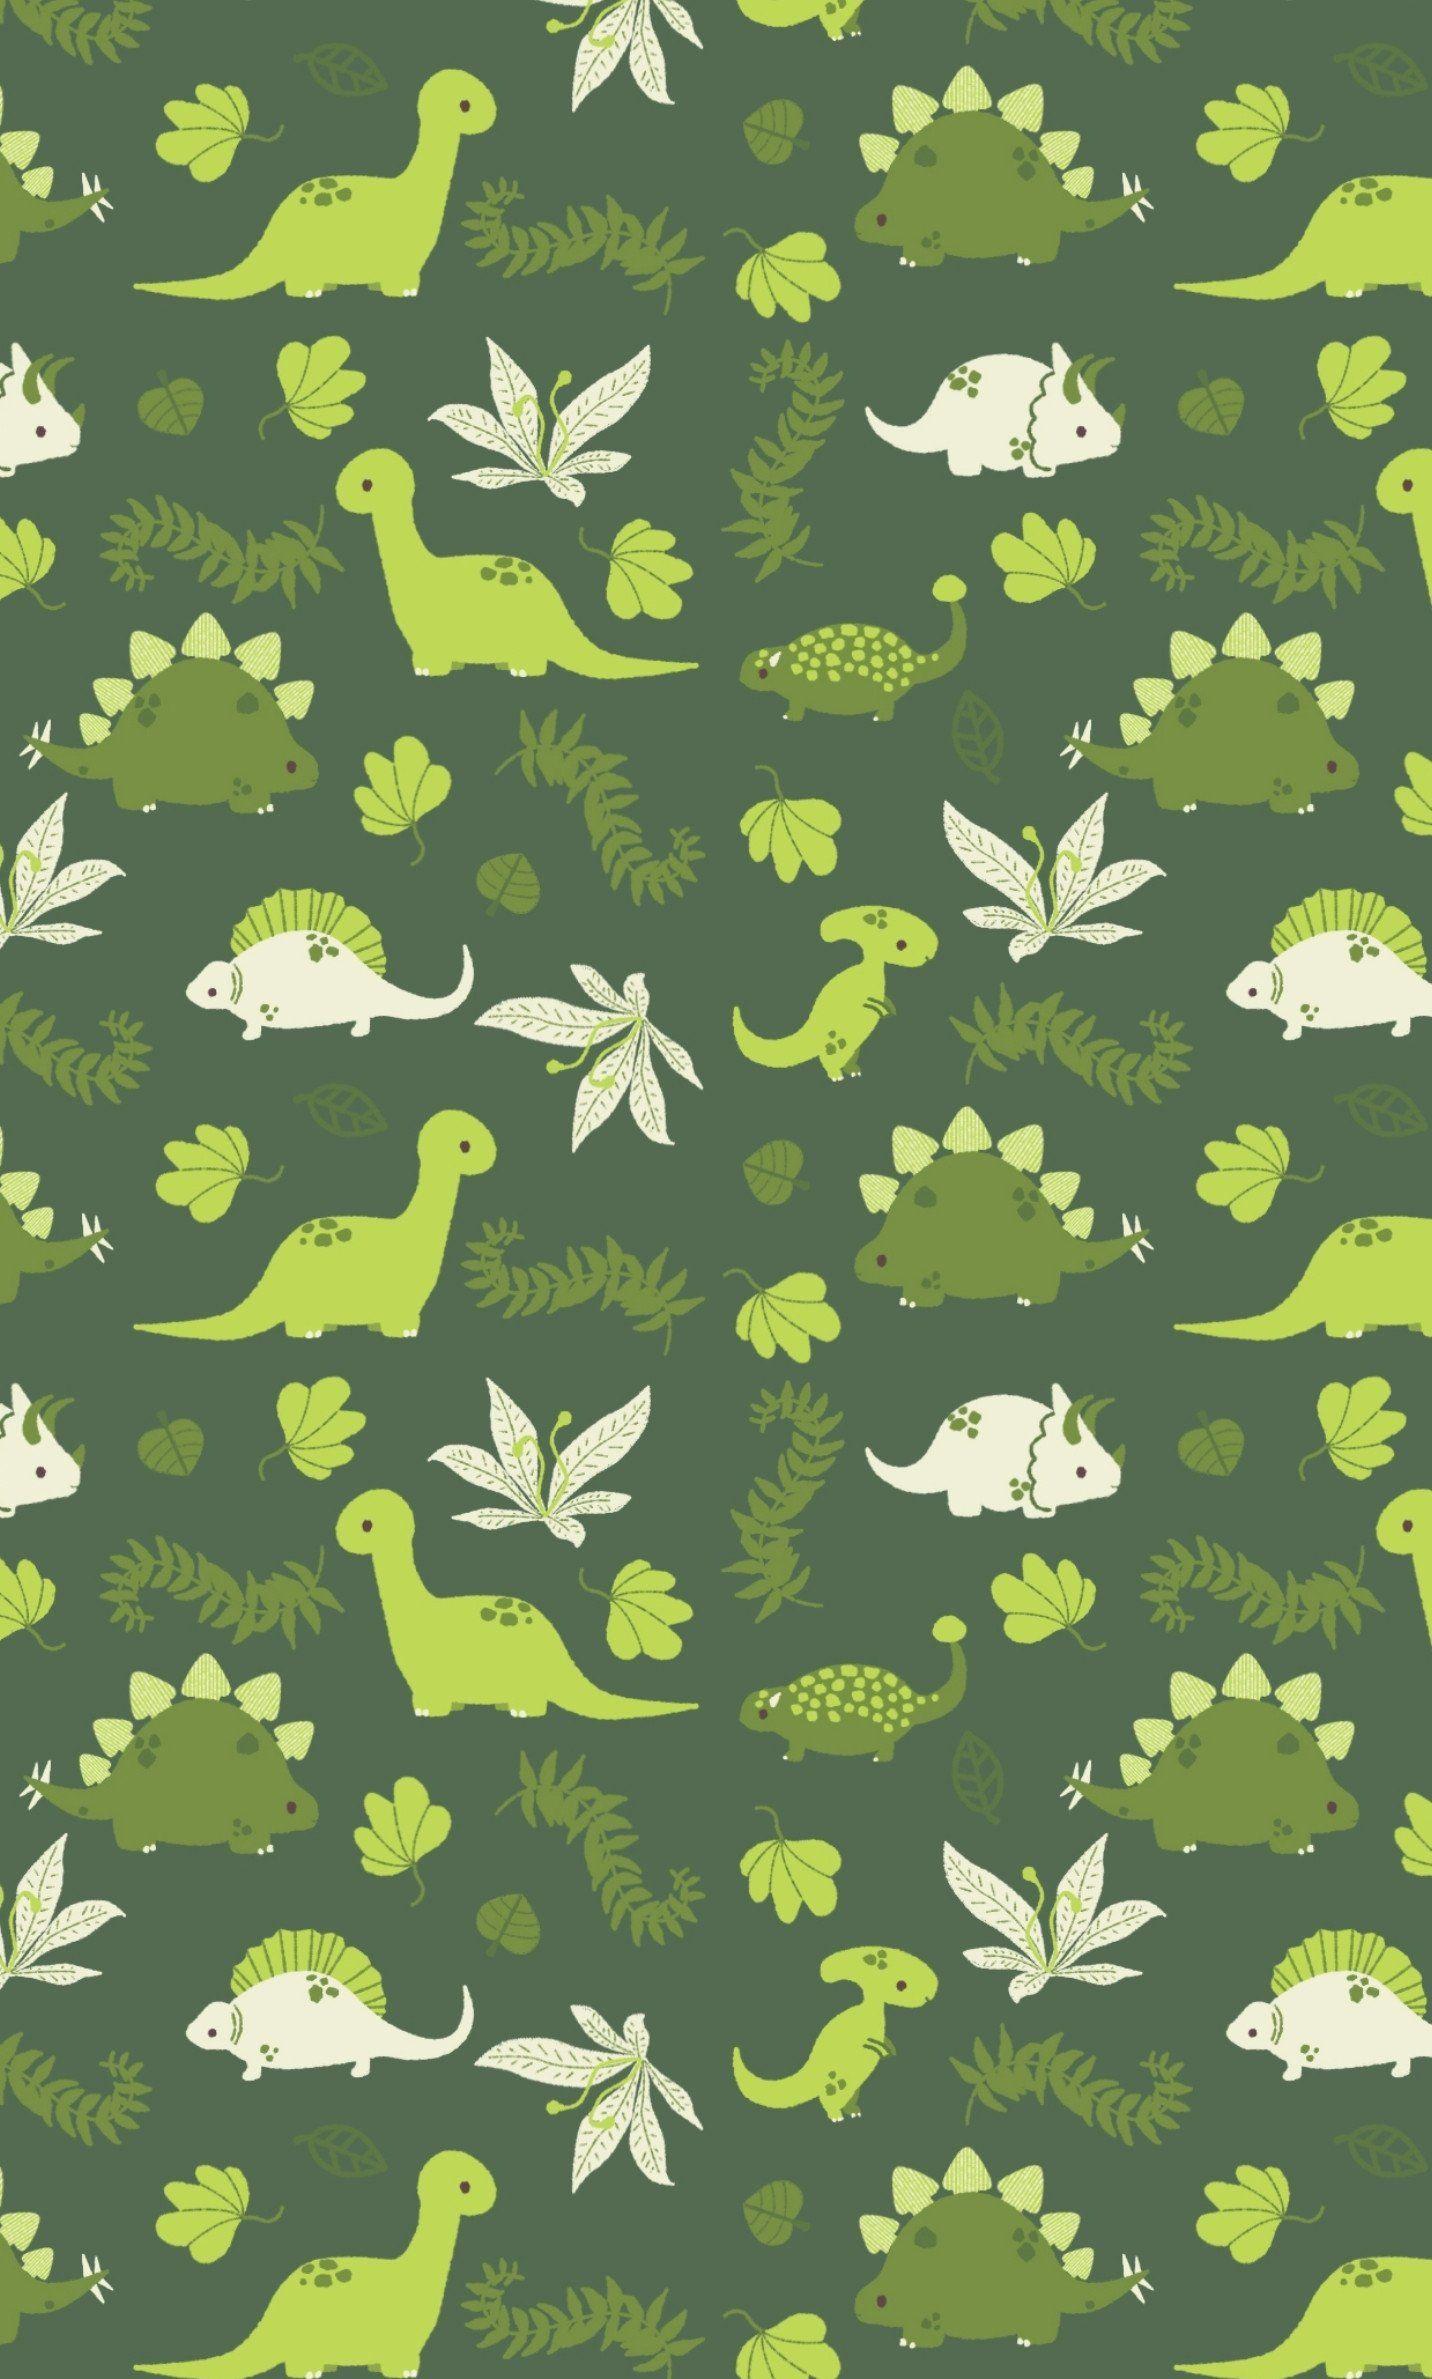 Cute Little Dinosaurs Smart Phone Wallpapers 4kphonewallpapersreddit Iphonewallpapersred Cute Patterns Wallpaper Wallpaper Iphone Cute Dinosaur Wallpaper